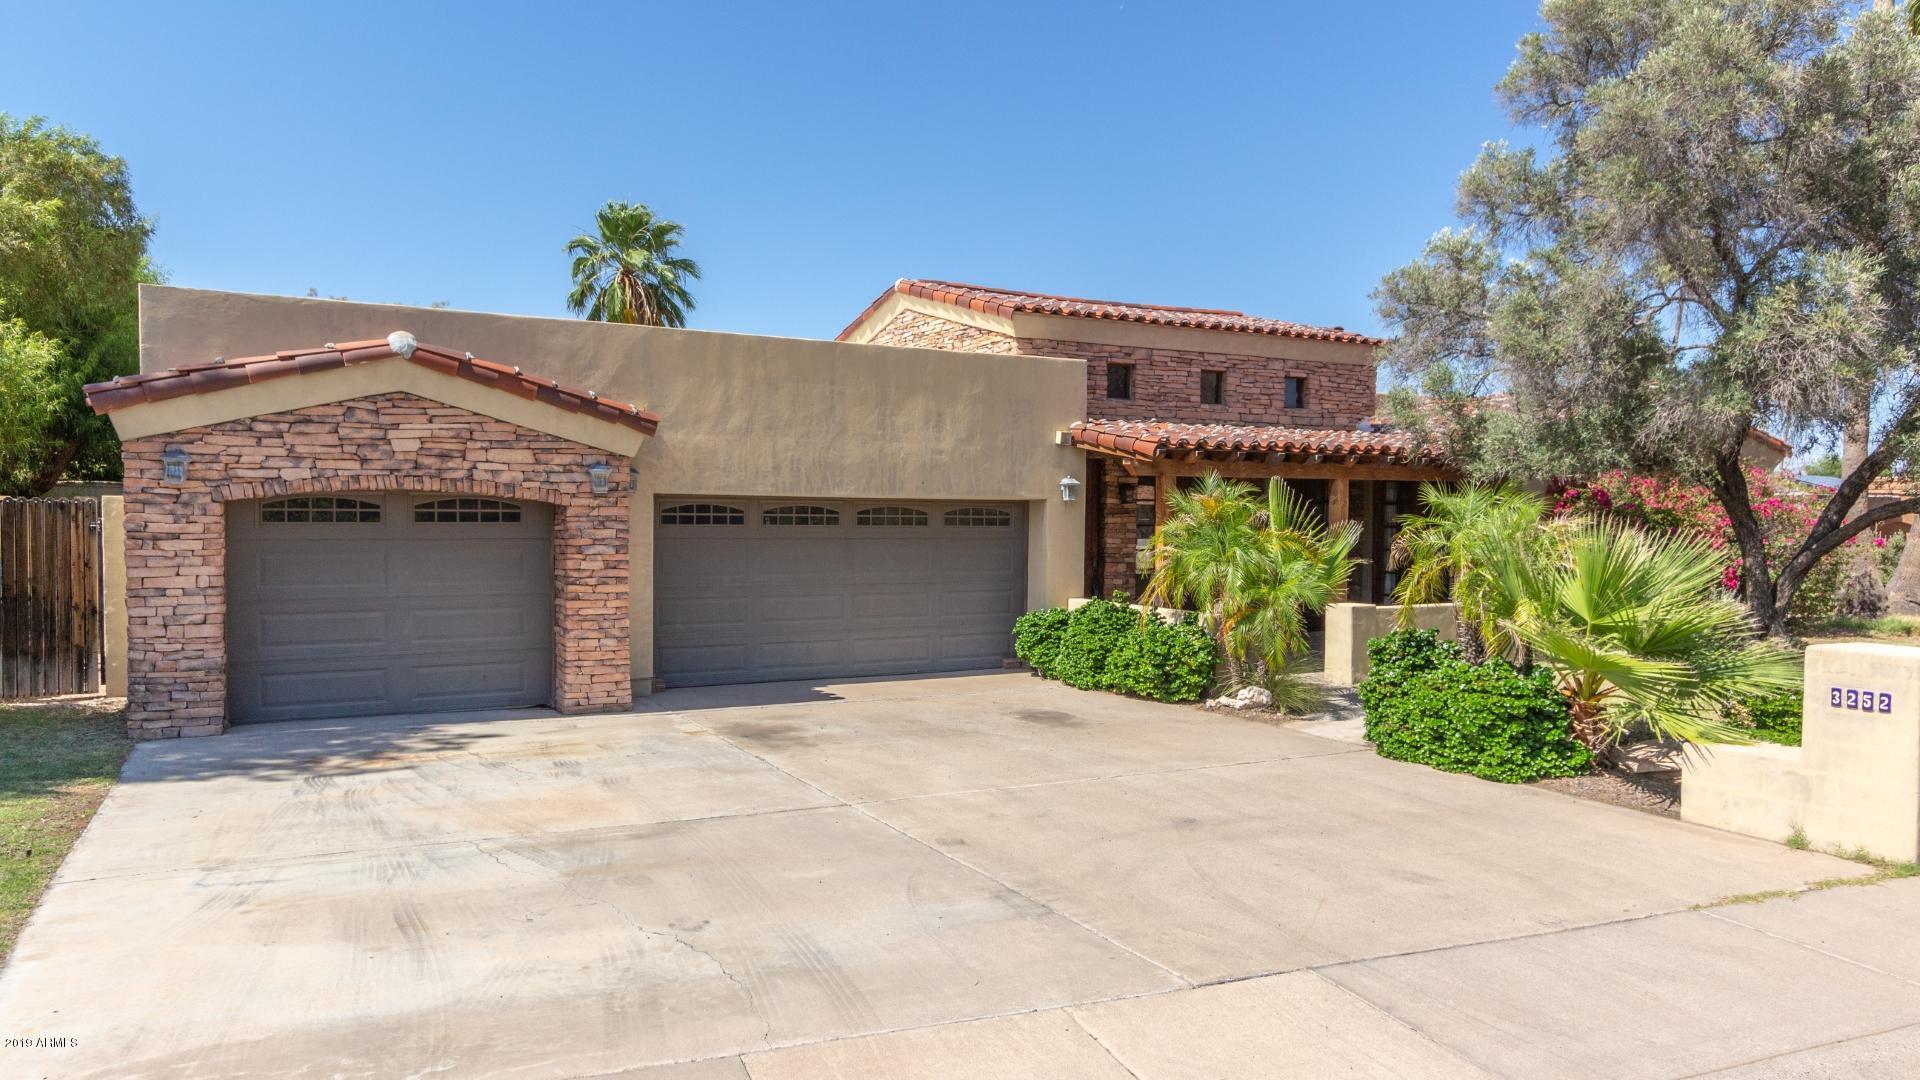 Photo of 3252 E VOGEL Avenue, Phoenix, AZ 85028